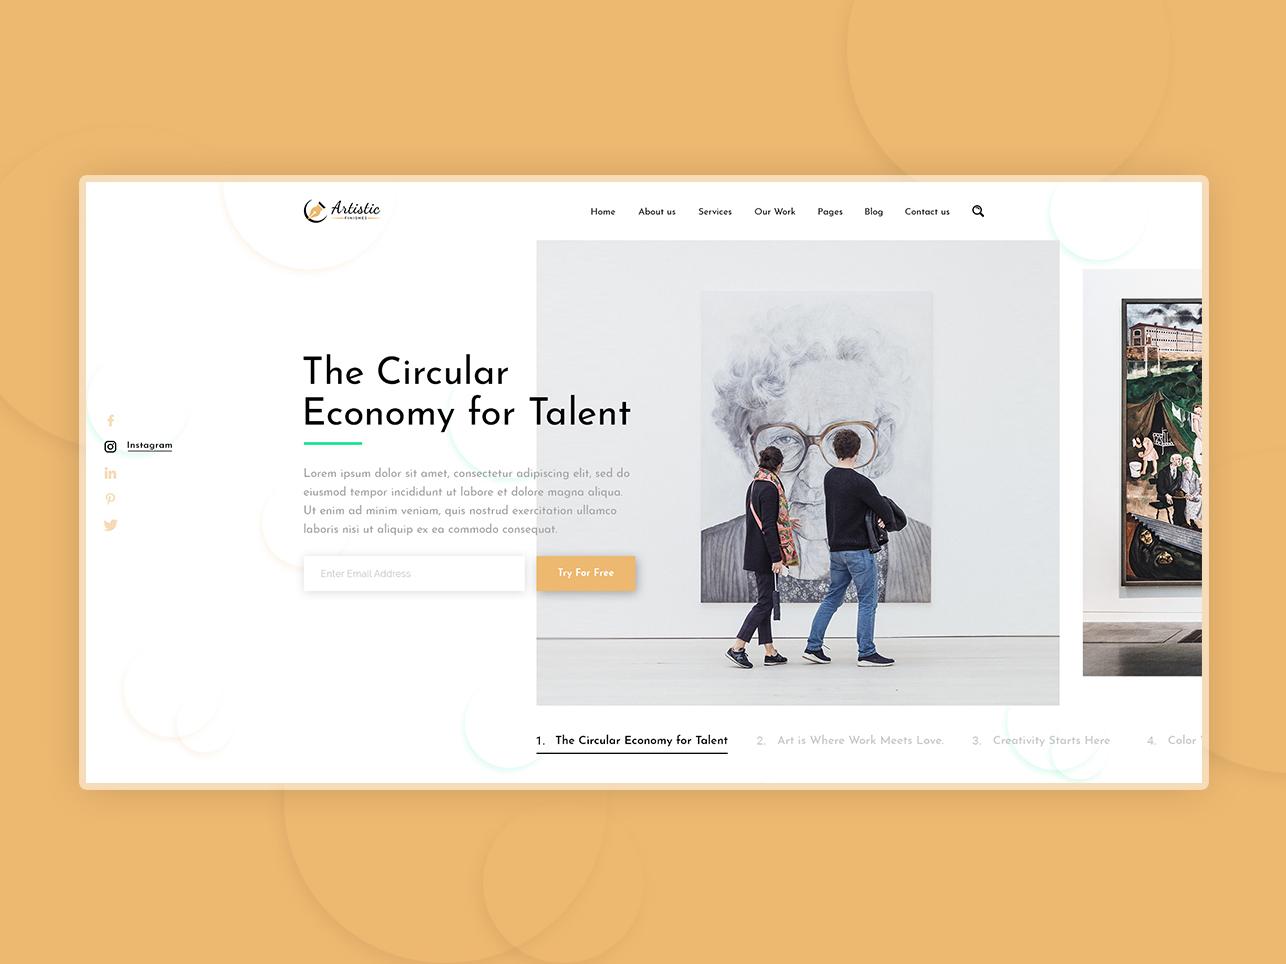 Artistic Slider ui designers web designers coreldraw adobe photoshop adobe illustrator adobe xd website design web design ui  ux ui design